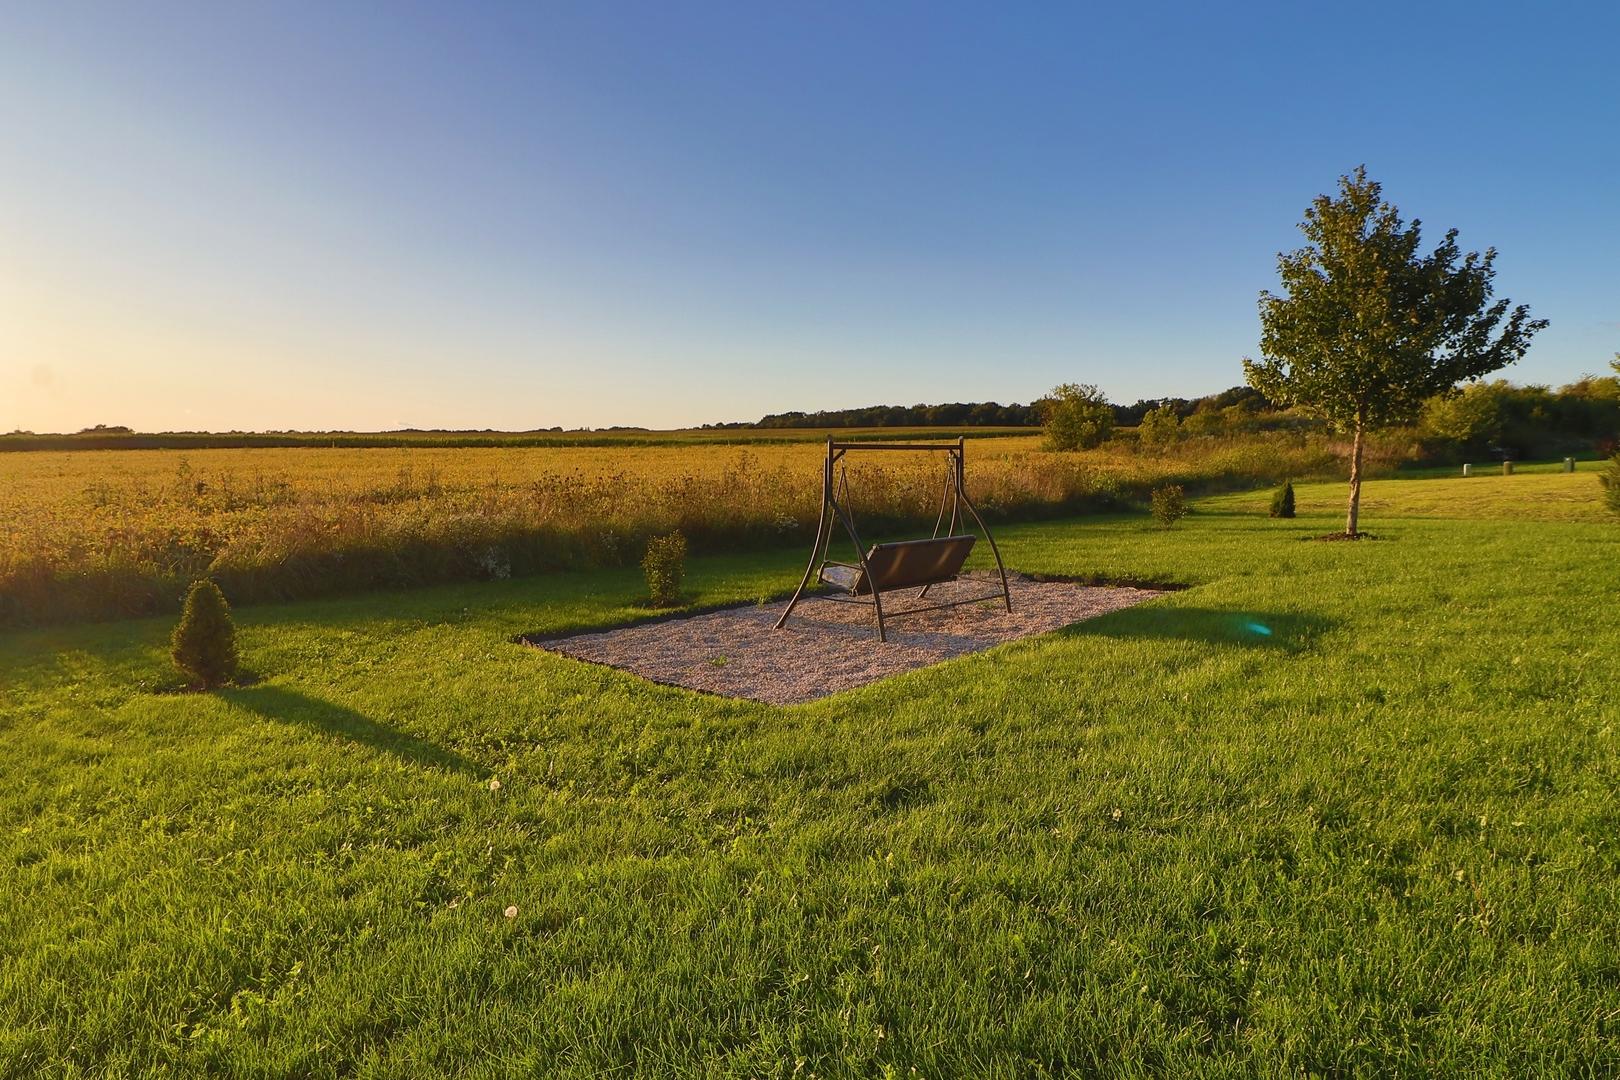 214 Cress Creek, Poplar Grove, Illinois, 61065